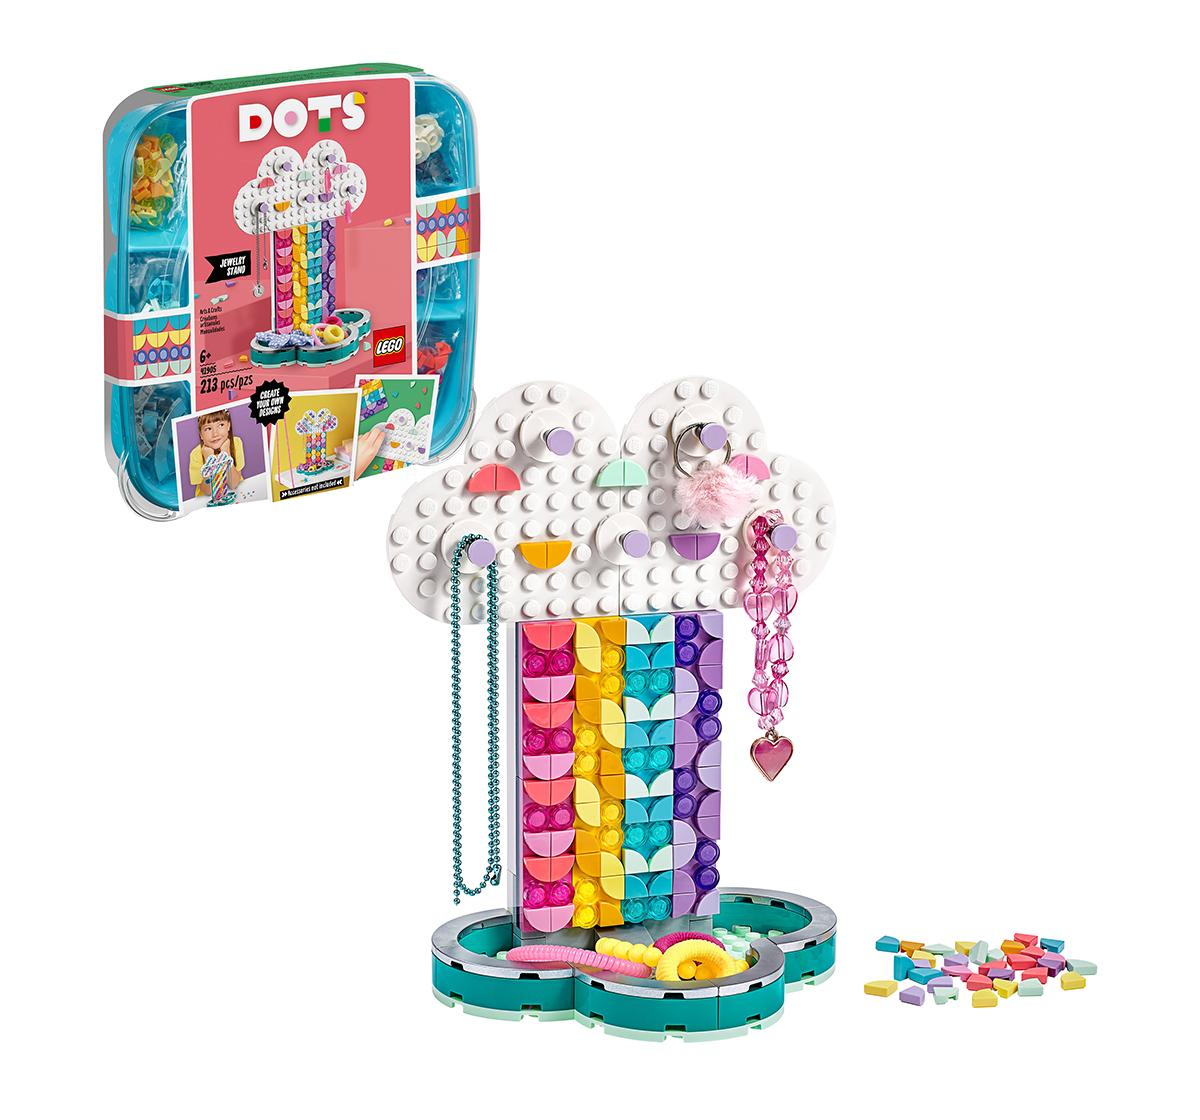 LEGO | LEGO 41905 Rainbow Jewelry Stand Lego Blocks for Girls age 6Y+